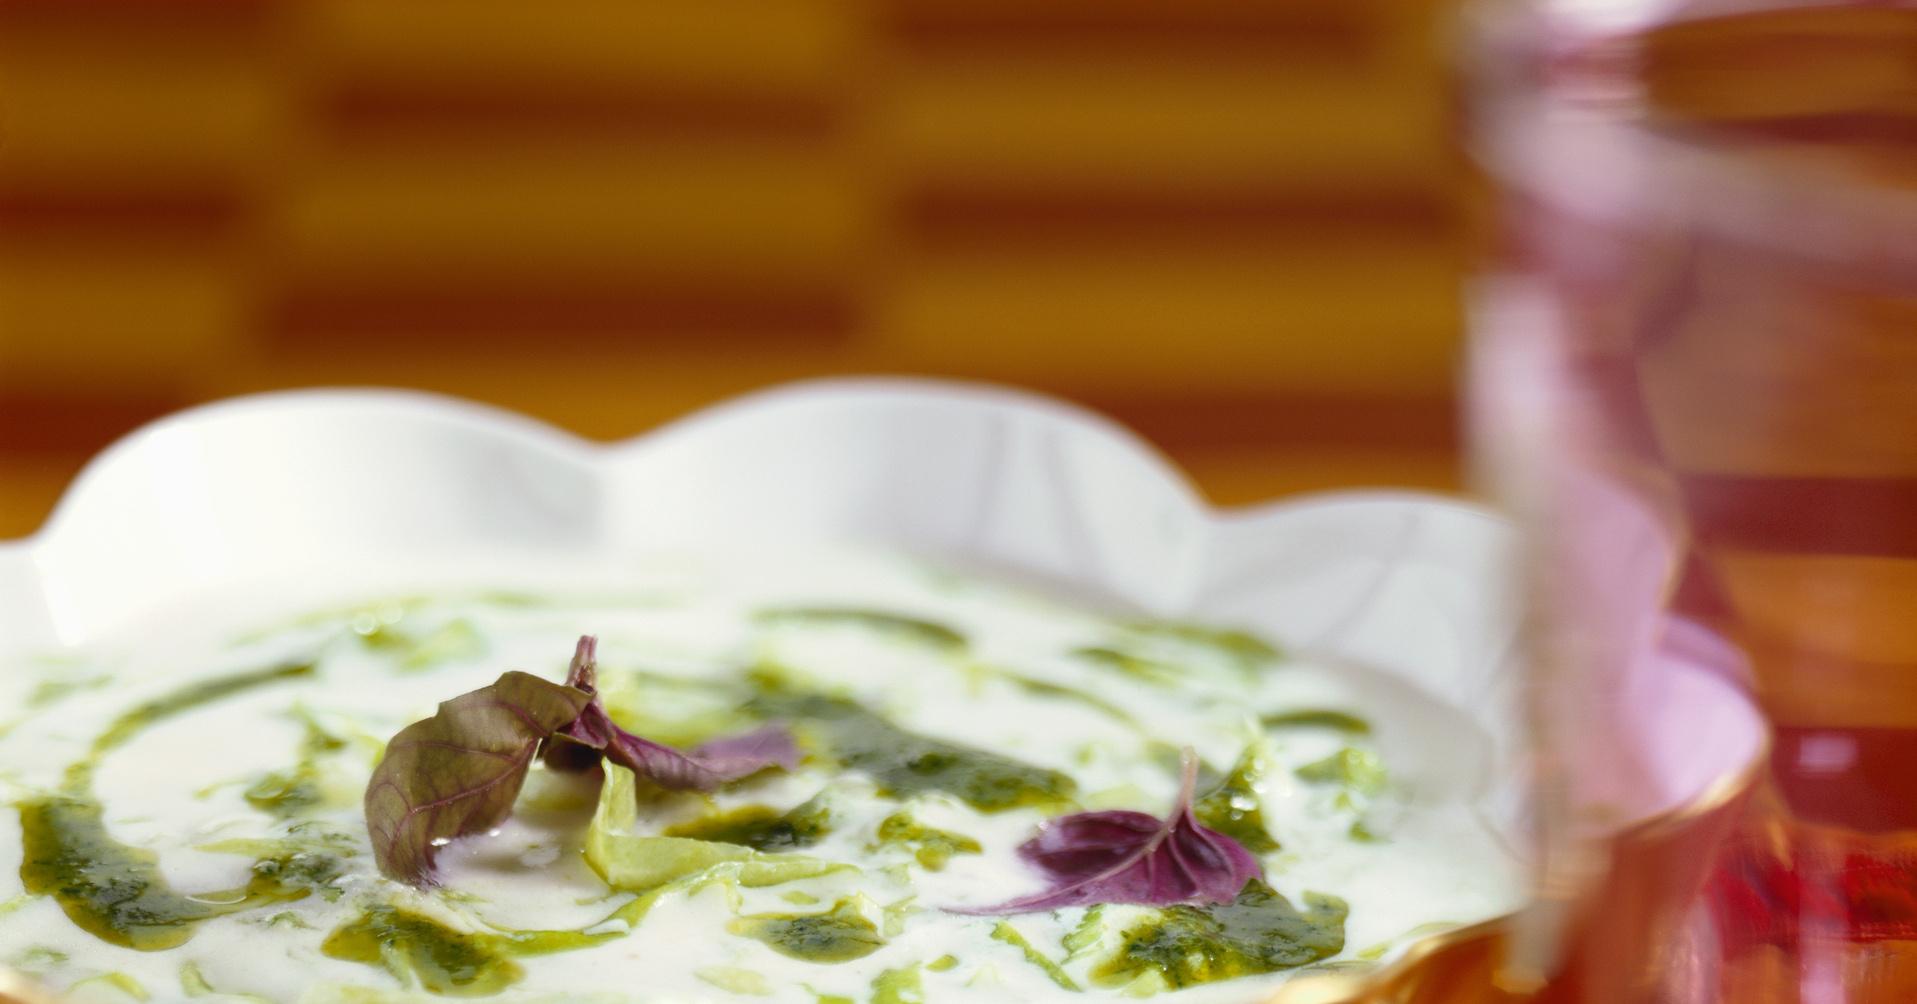 Армянский спас рецепт пошагово